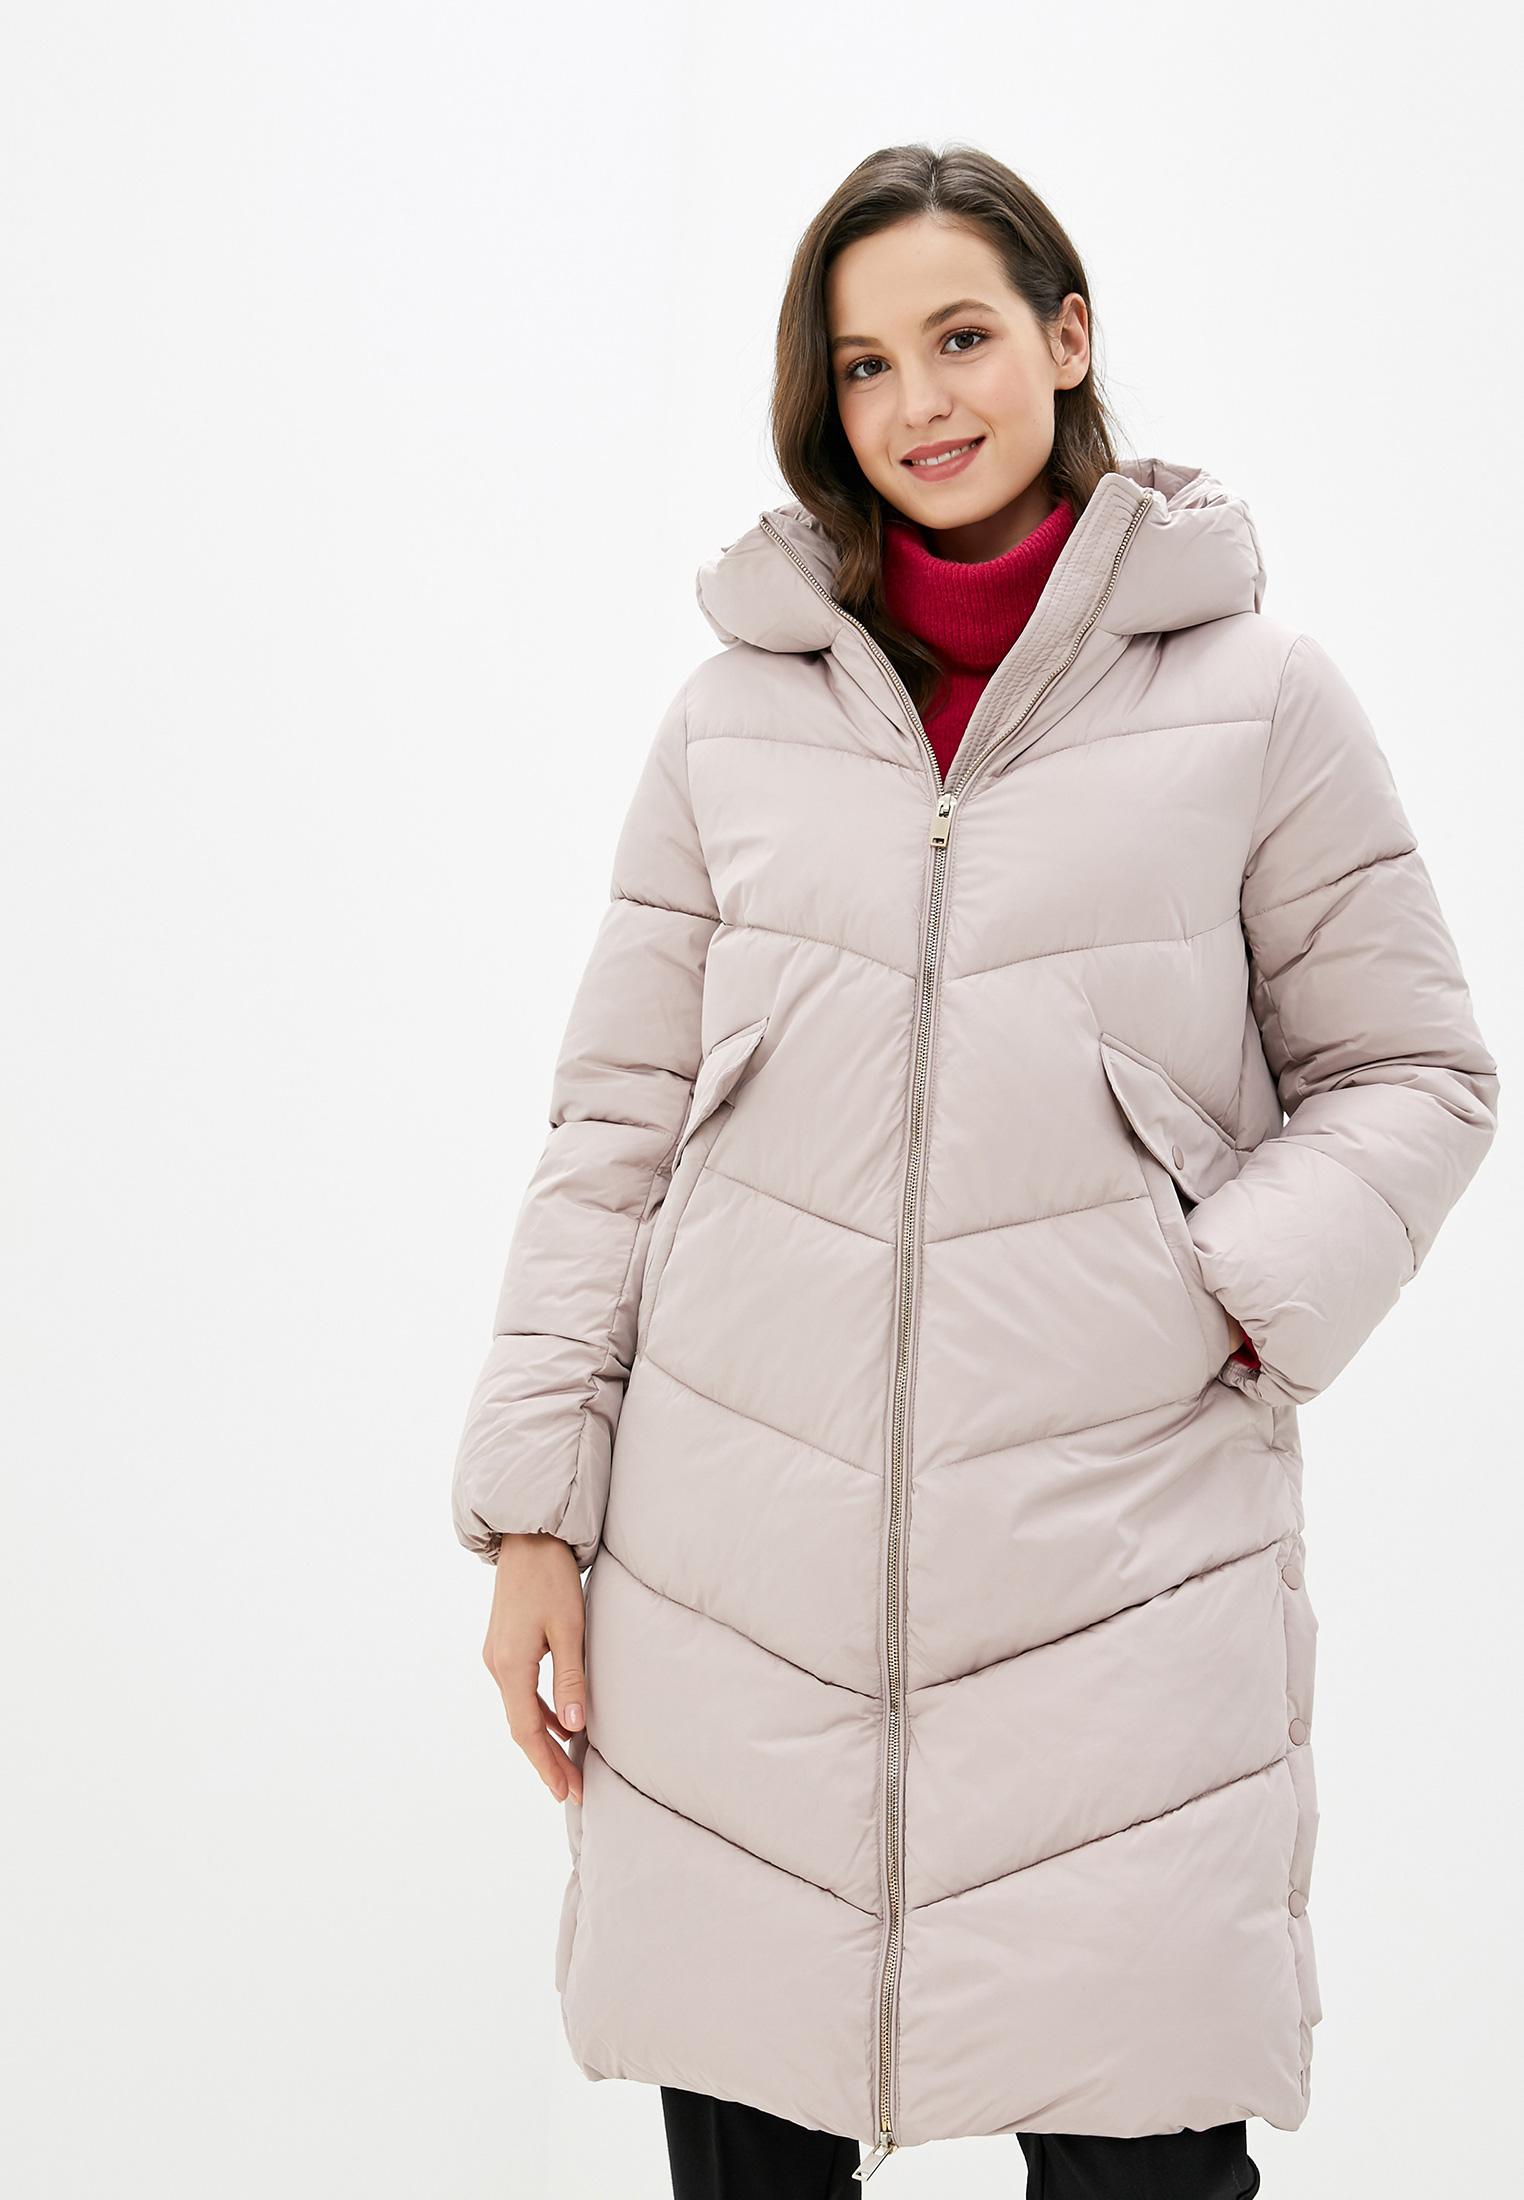 Куртка утепленная, Zarina, цвет: розовый. Артикул: MP002XW1221D. Одежда / Верхняя одежда